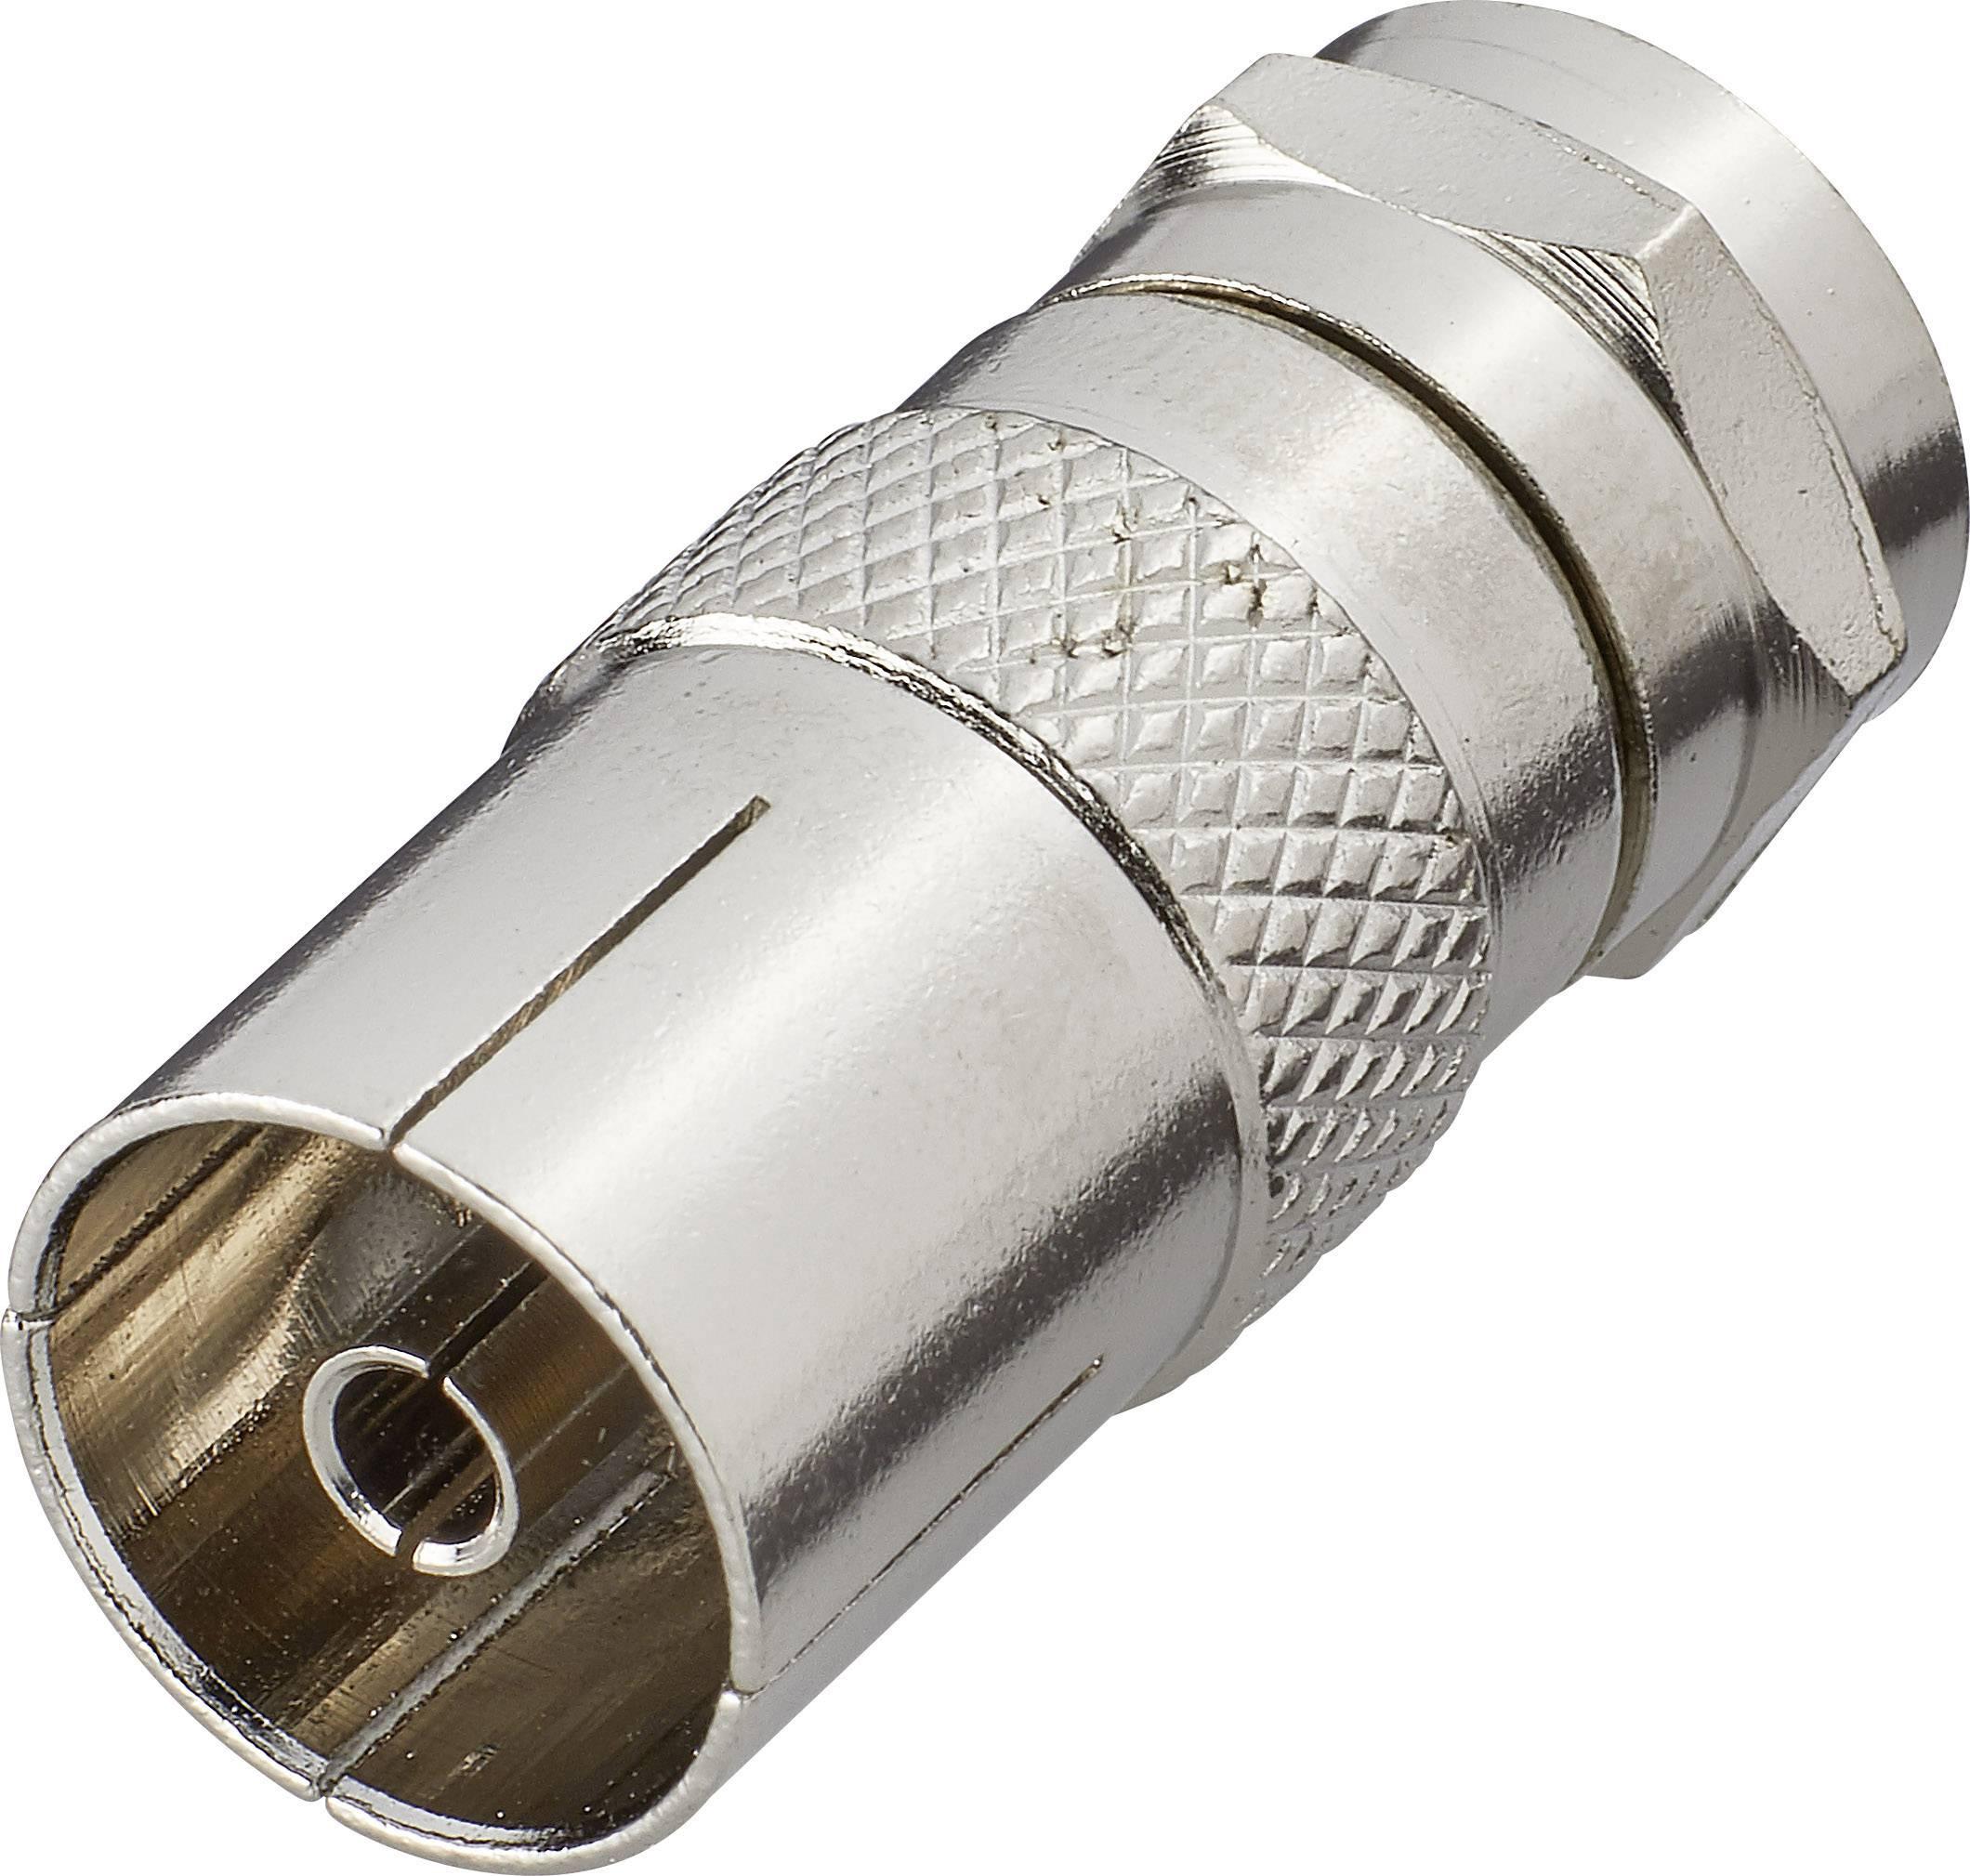 SAT / anténny adaptér RENKFORCE F zástrčka - anténna zásuvka 75 Ω